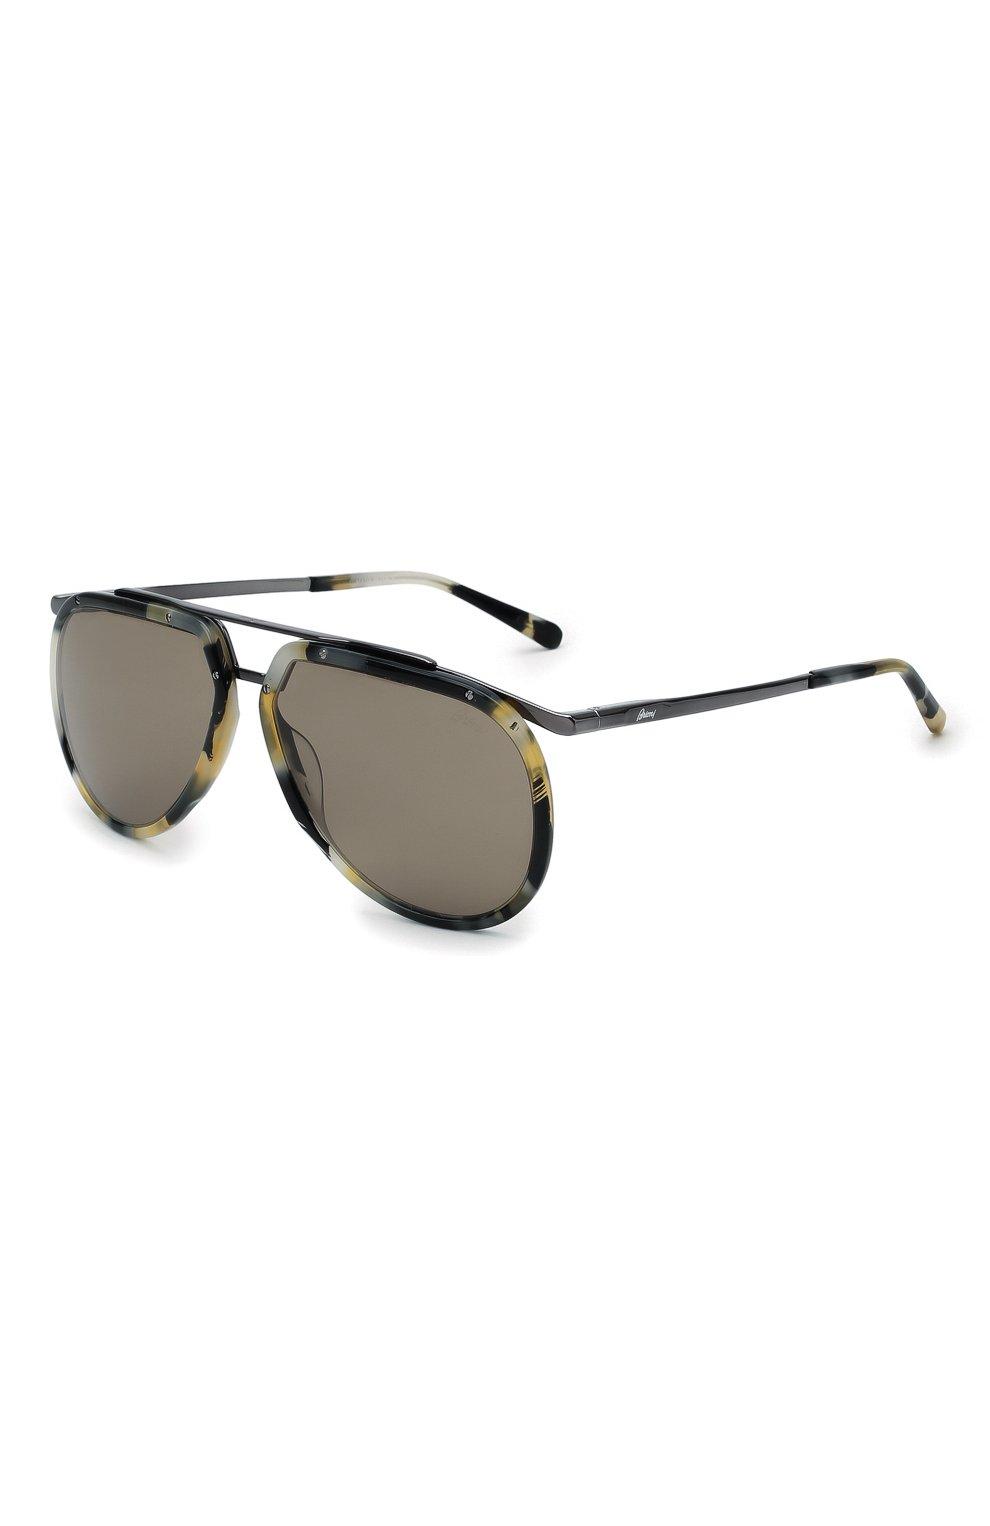 Мужские солнцезащитные очки BRIONI разноцветного цвета, арт. 0DC900/P3ZAC | Фото 1